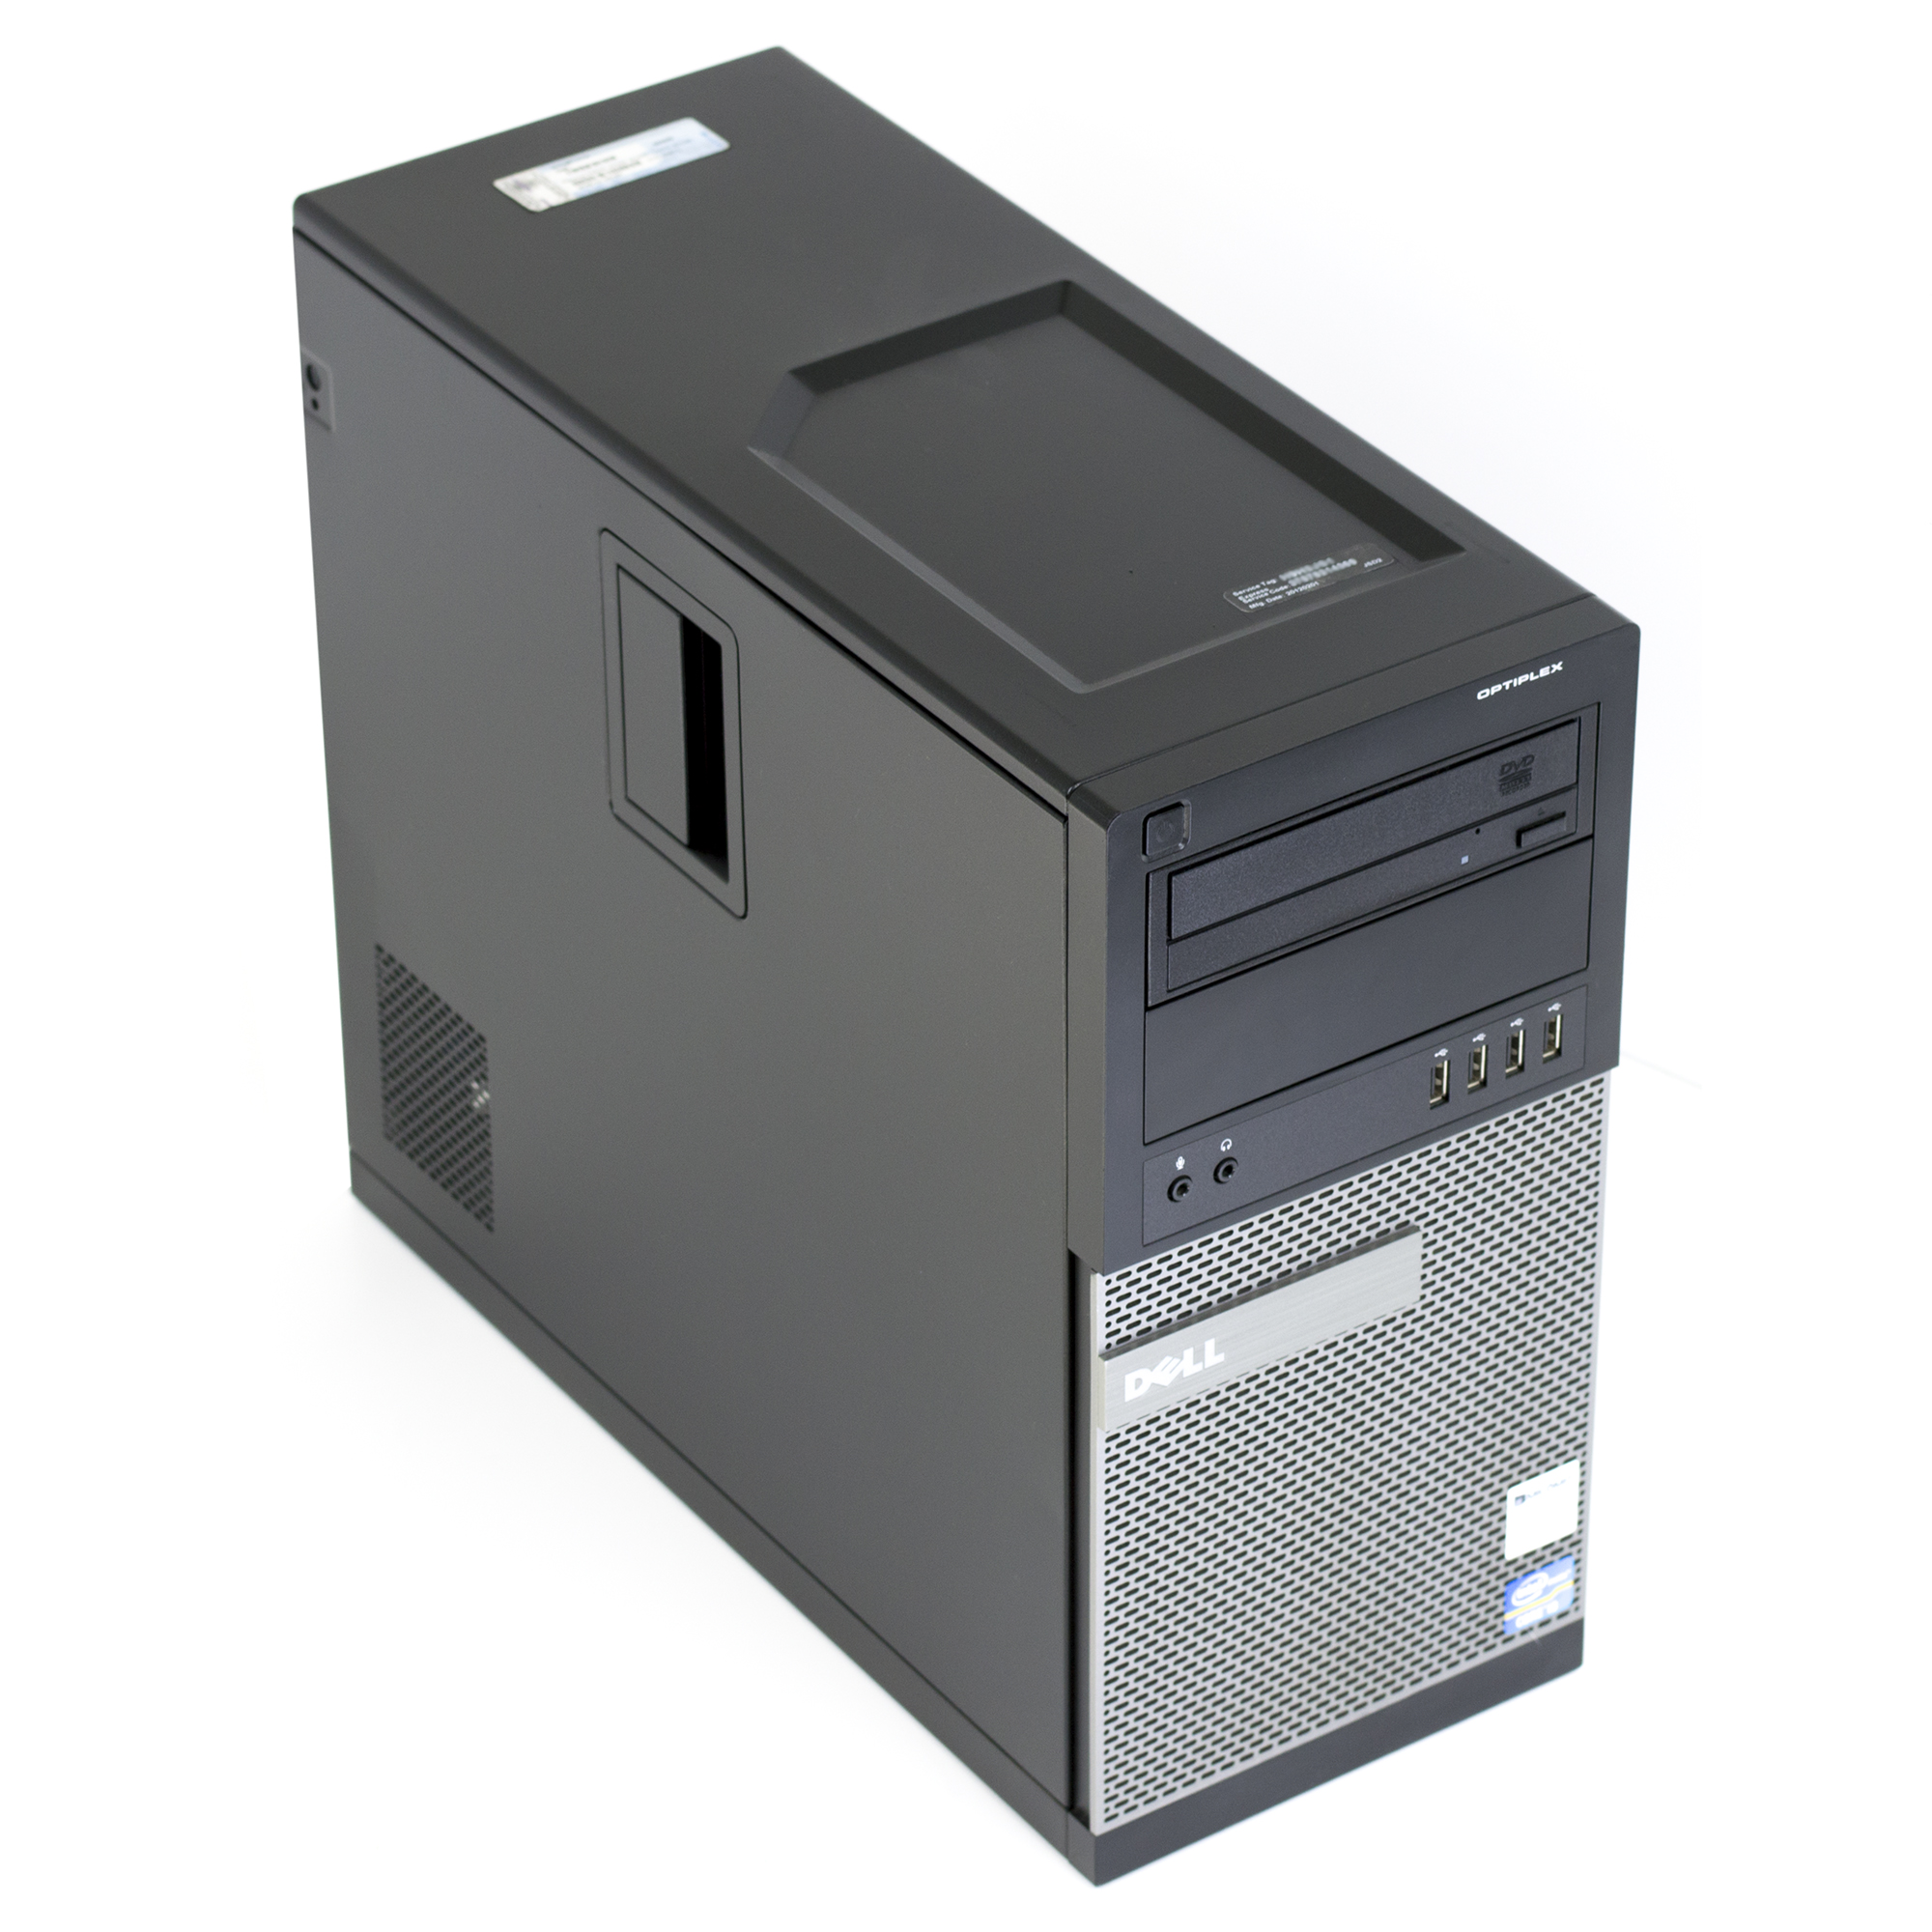 Dell Optiplex 790 Tower I5-2400 Quad Core 3.10Ghz 8Gb 500Gb Dvdrw Windows 10 Home 64 Bit